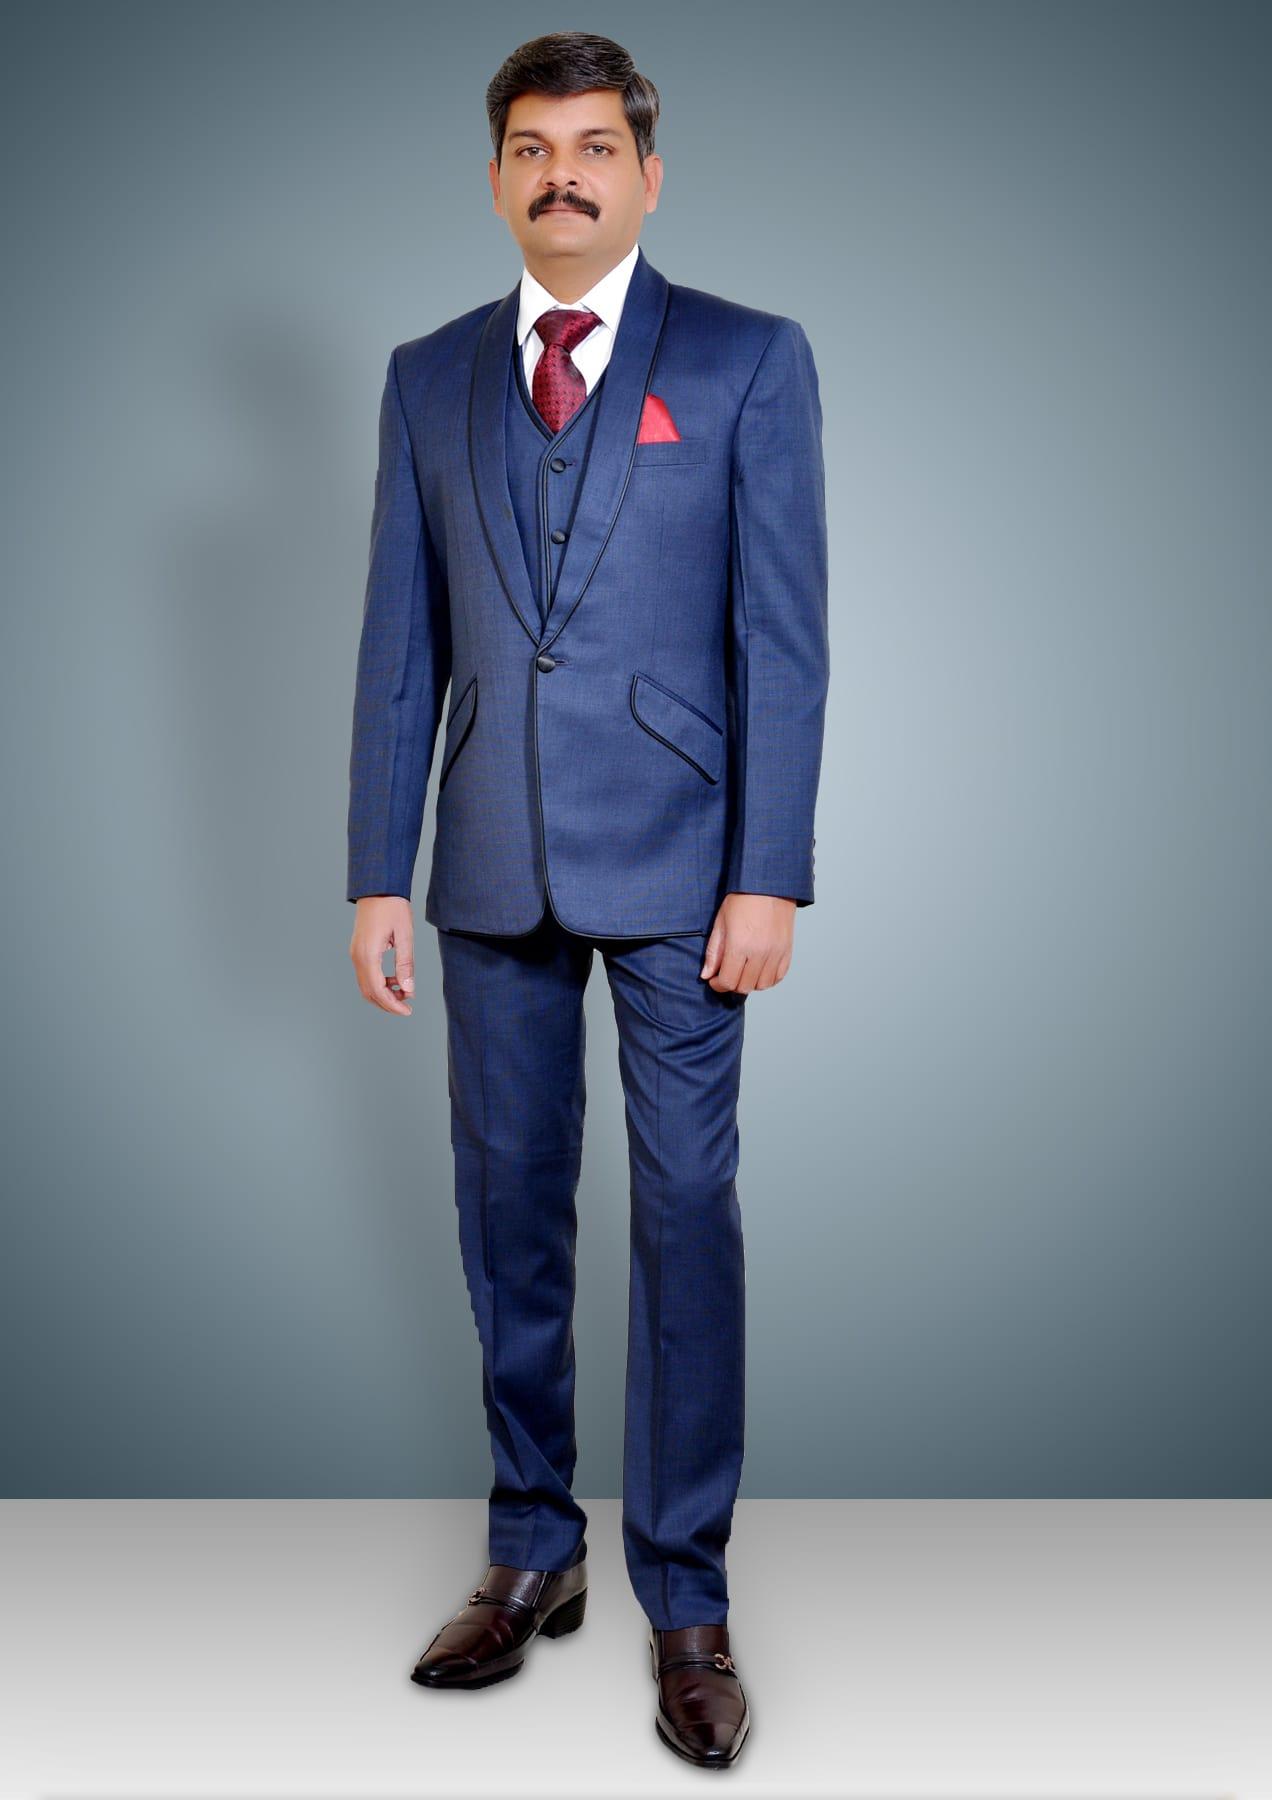 Mens Western Clothing on Rent & Lend: Vastram Fashion Rental India